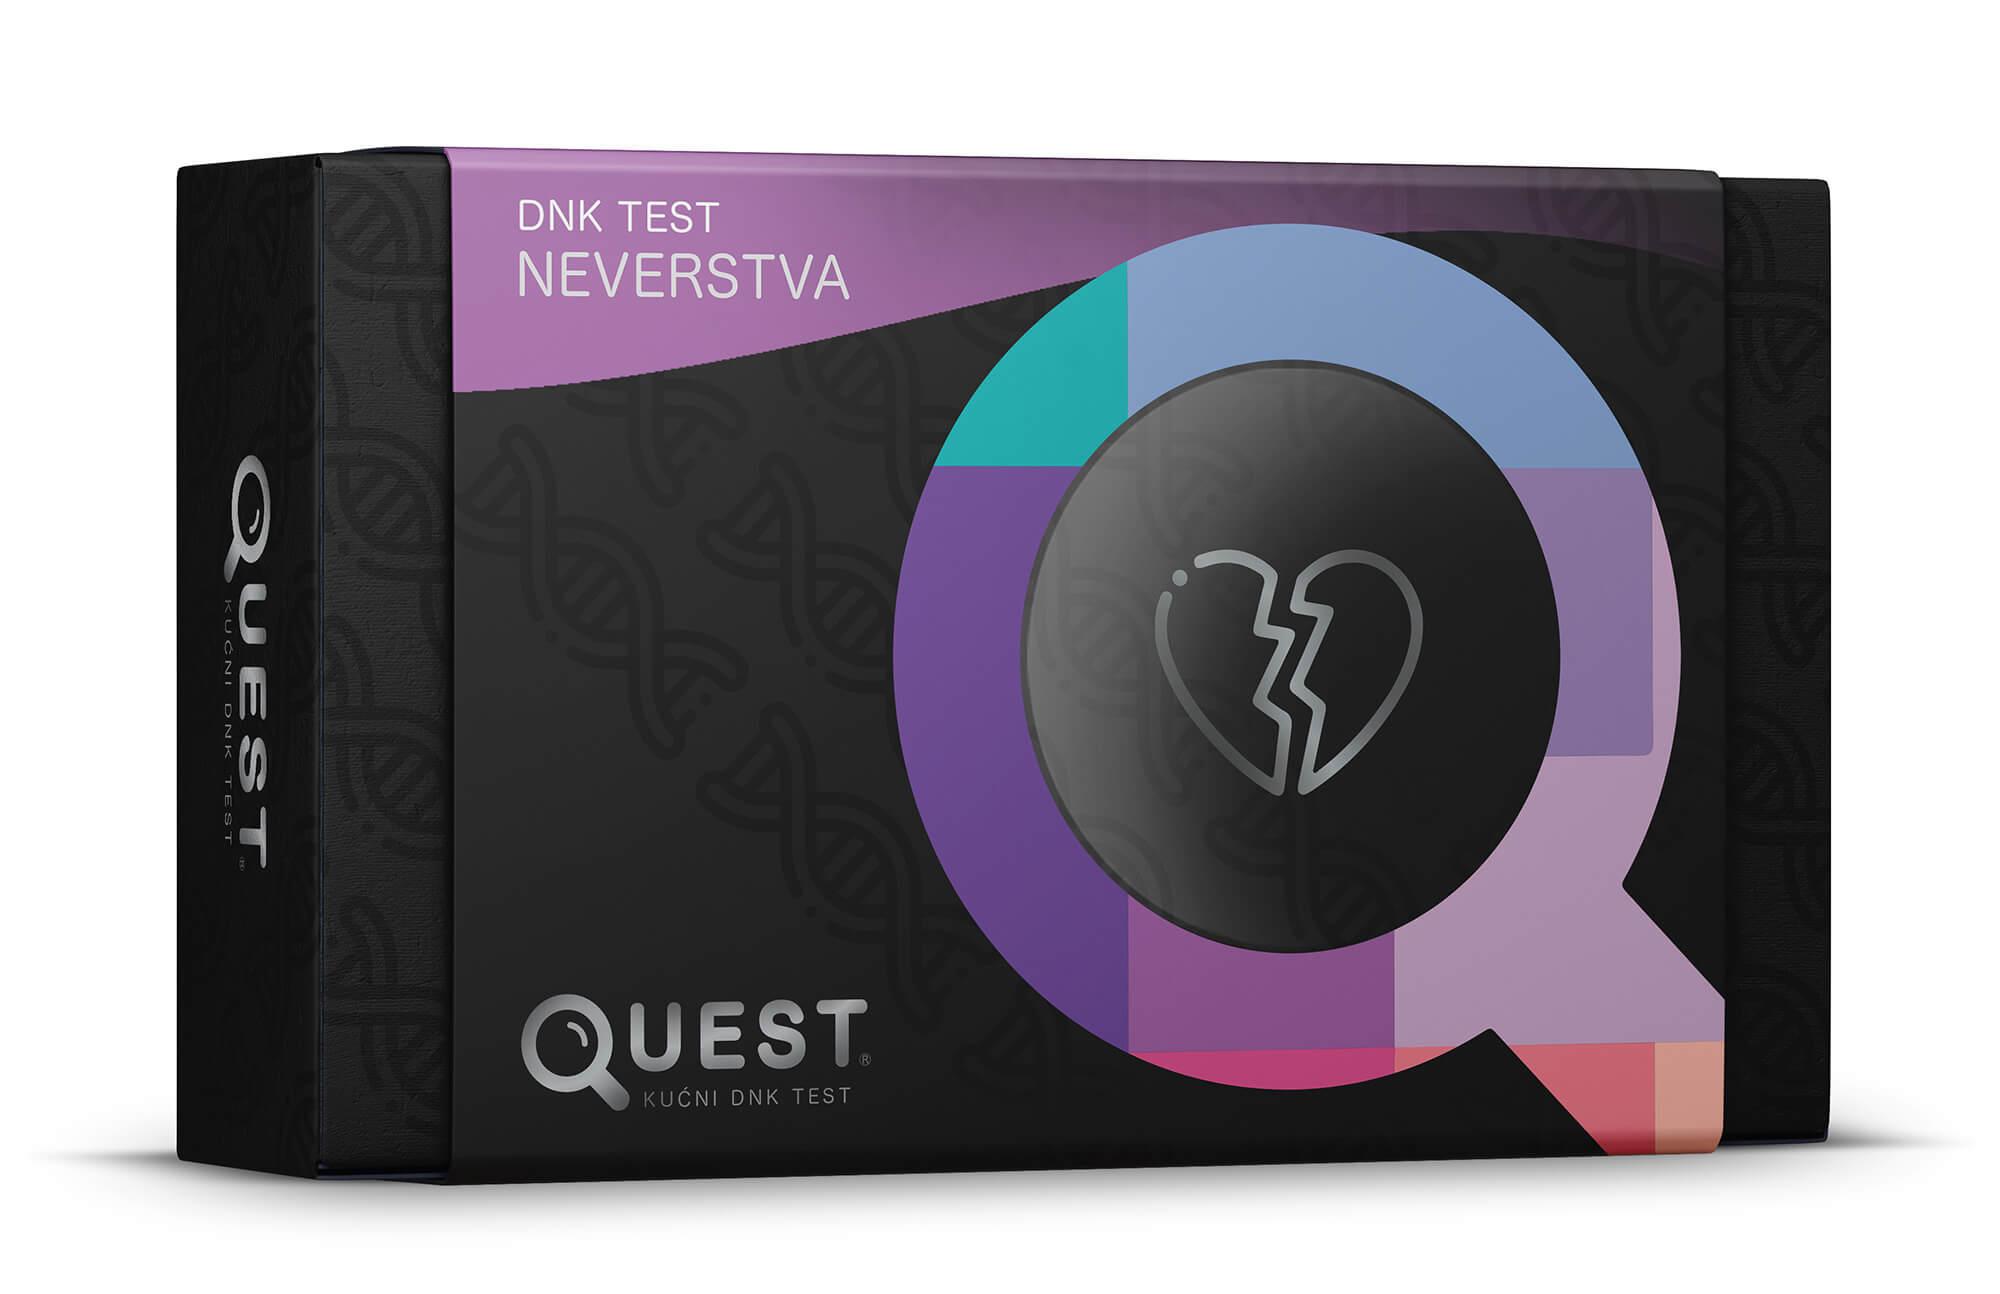 neverstvo-proizvod dnk test neverstva quest